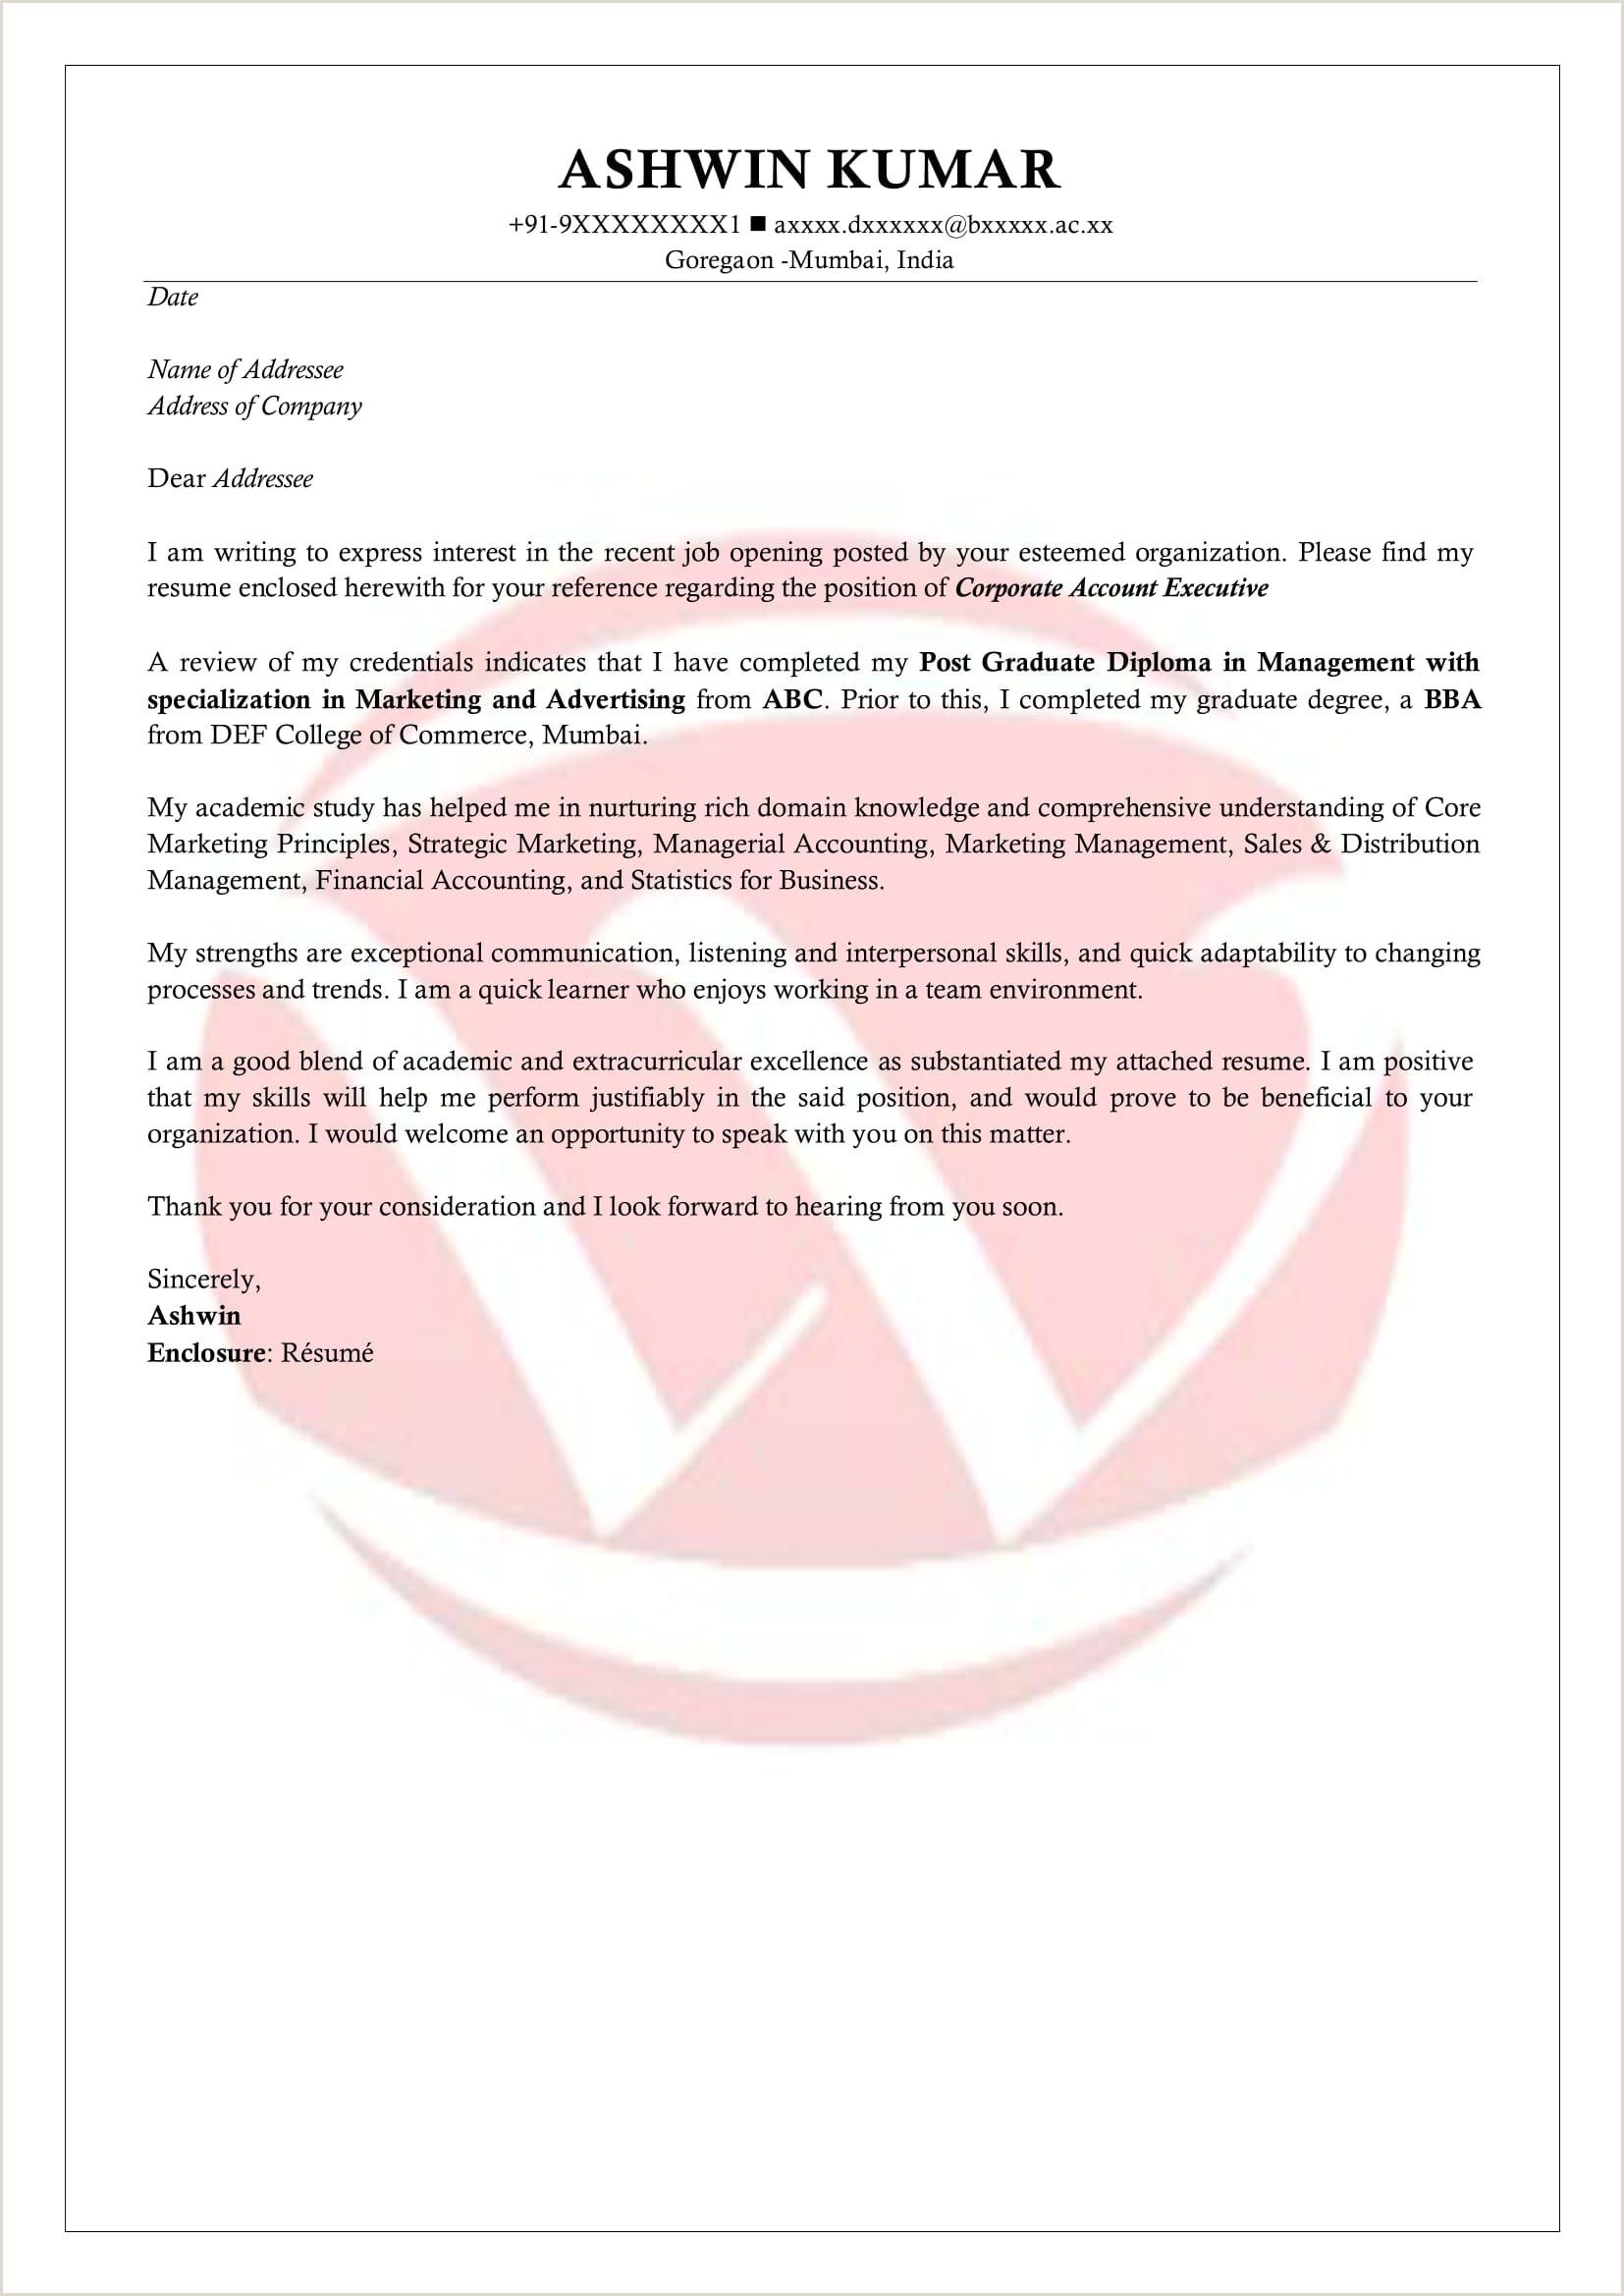 Fresher Resume Format For Biotechnology Freshers Sample Cover Letter Format Download Cover Letter